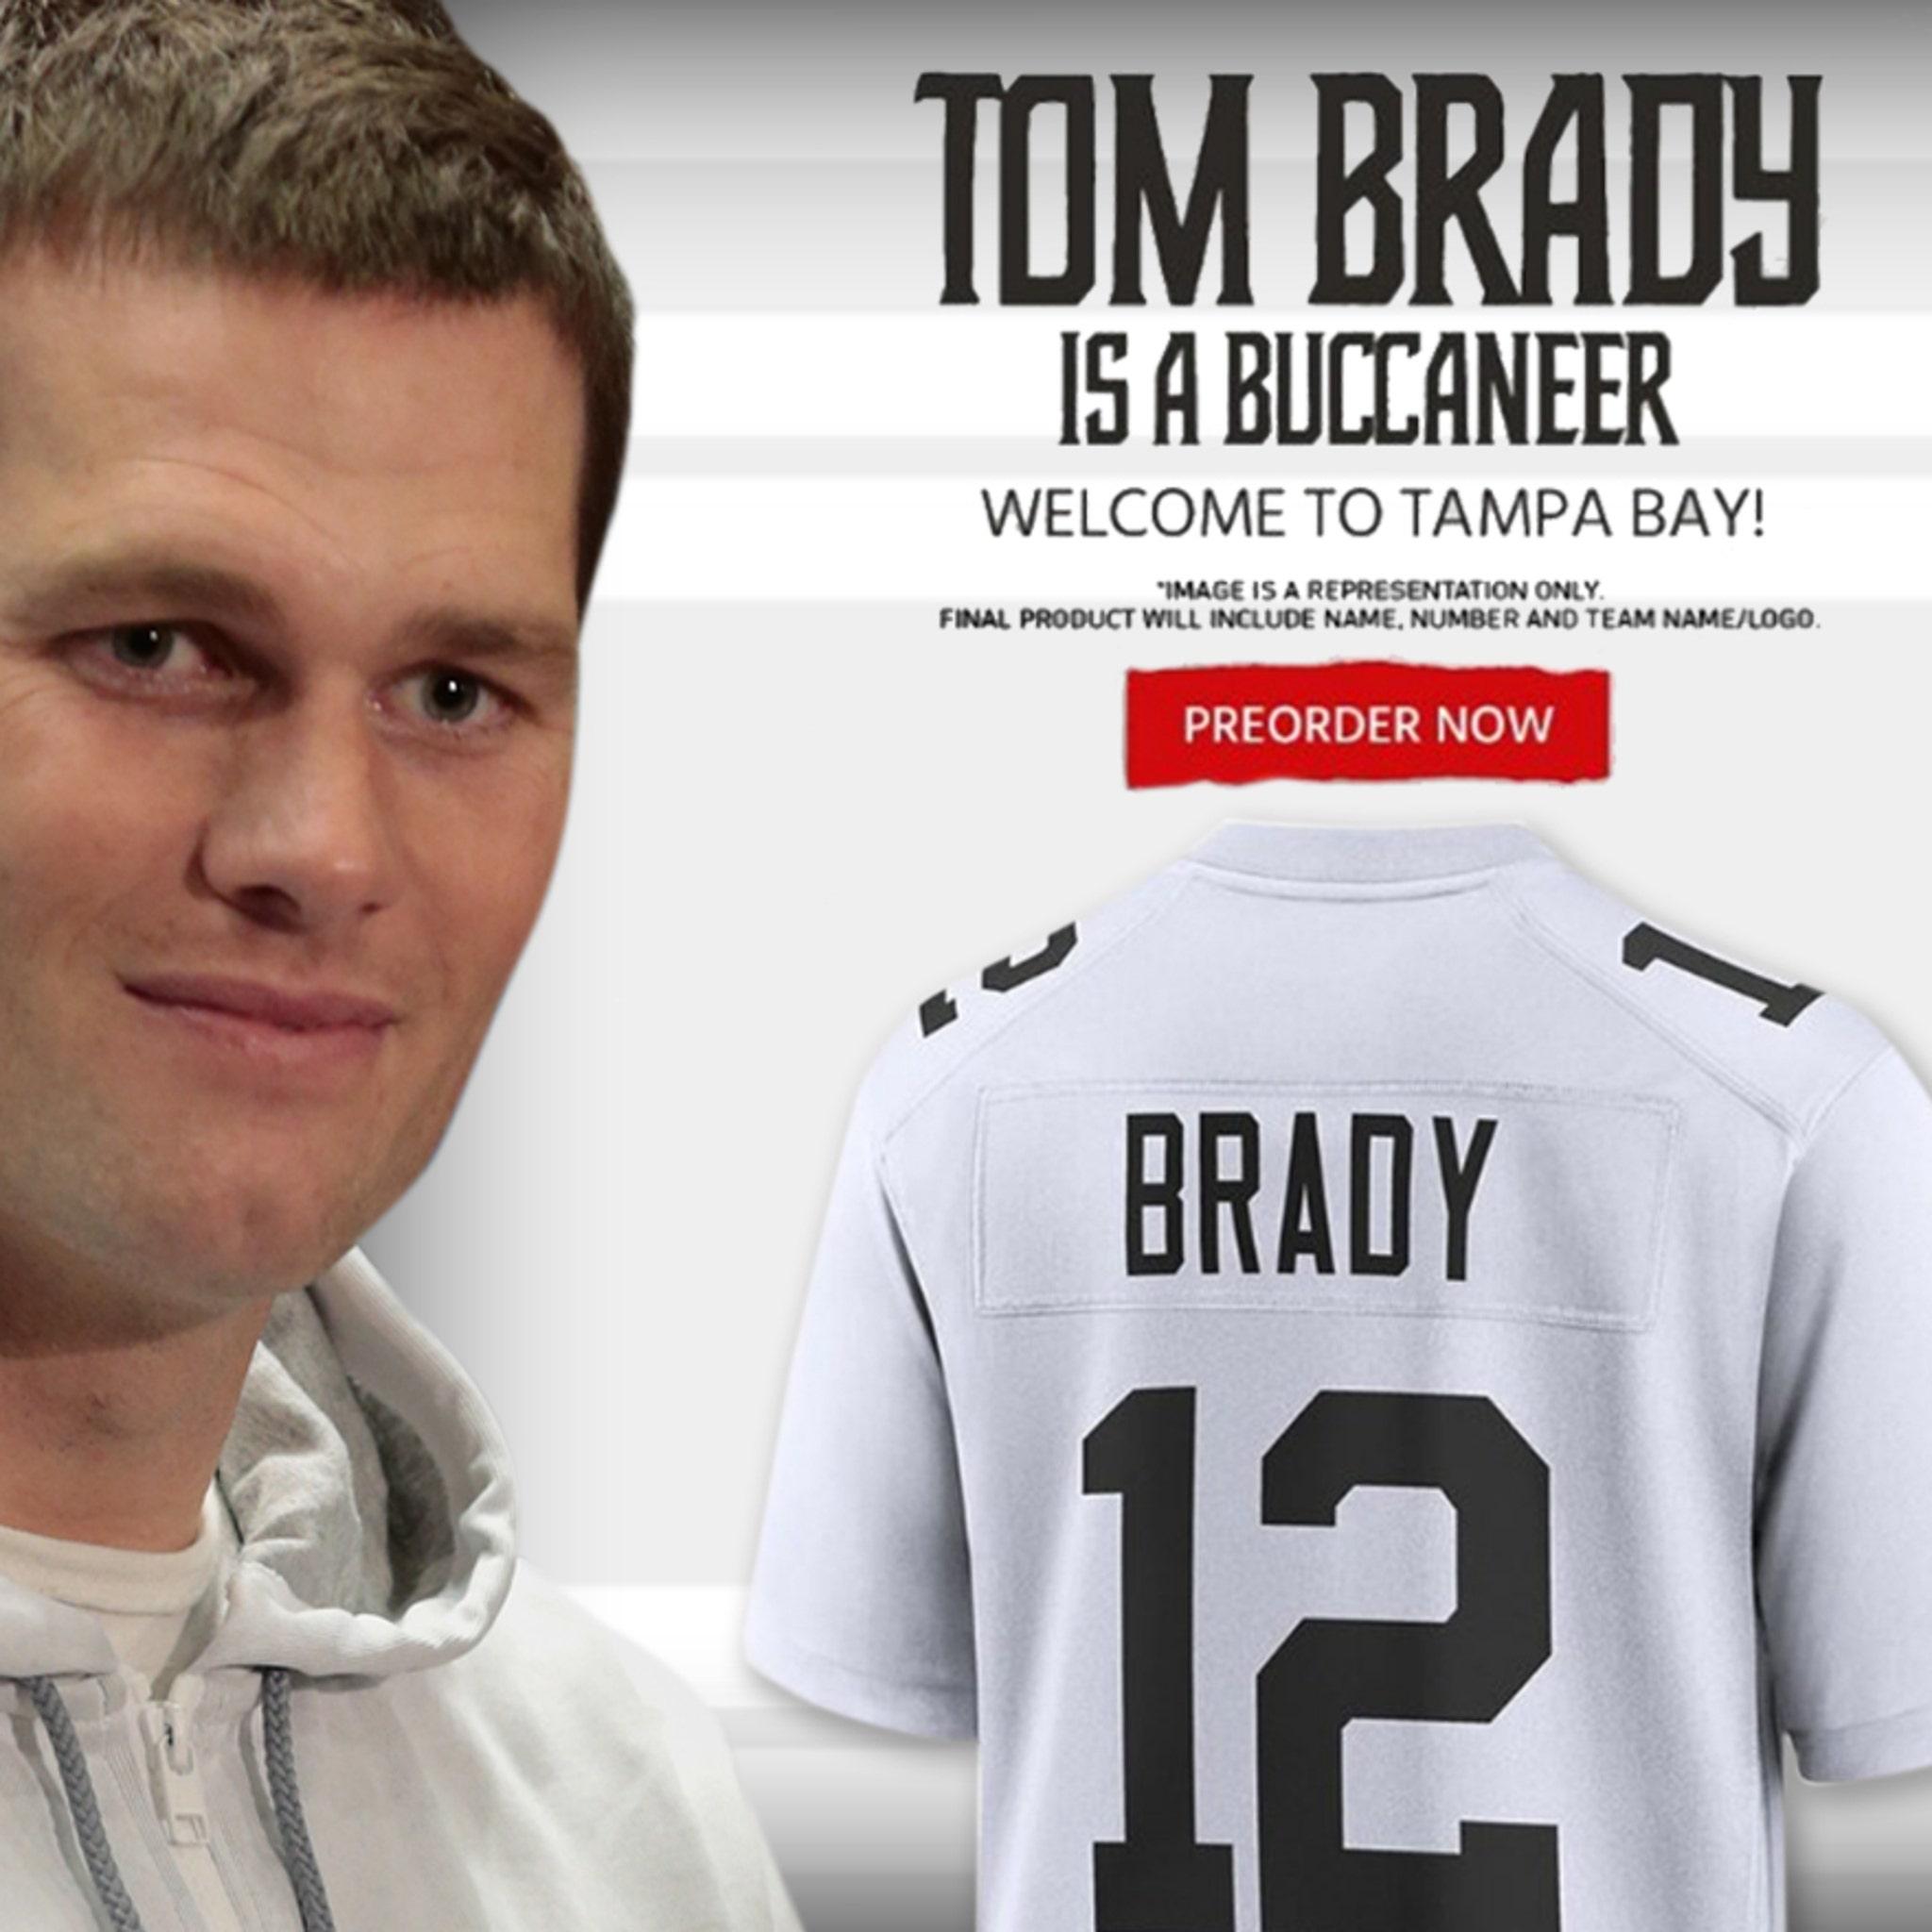 Bucs Already Selling Tom Brady #12 Jerseys, QB Puts On Cliche ...